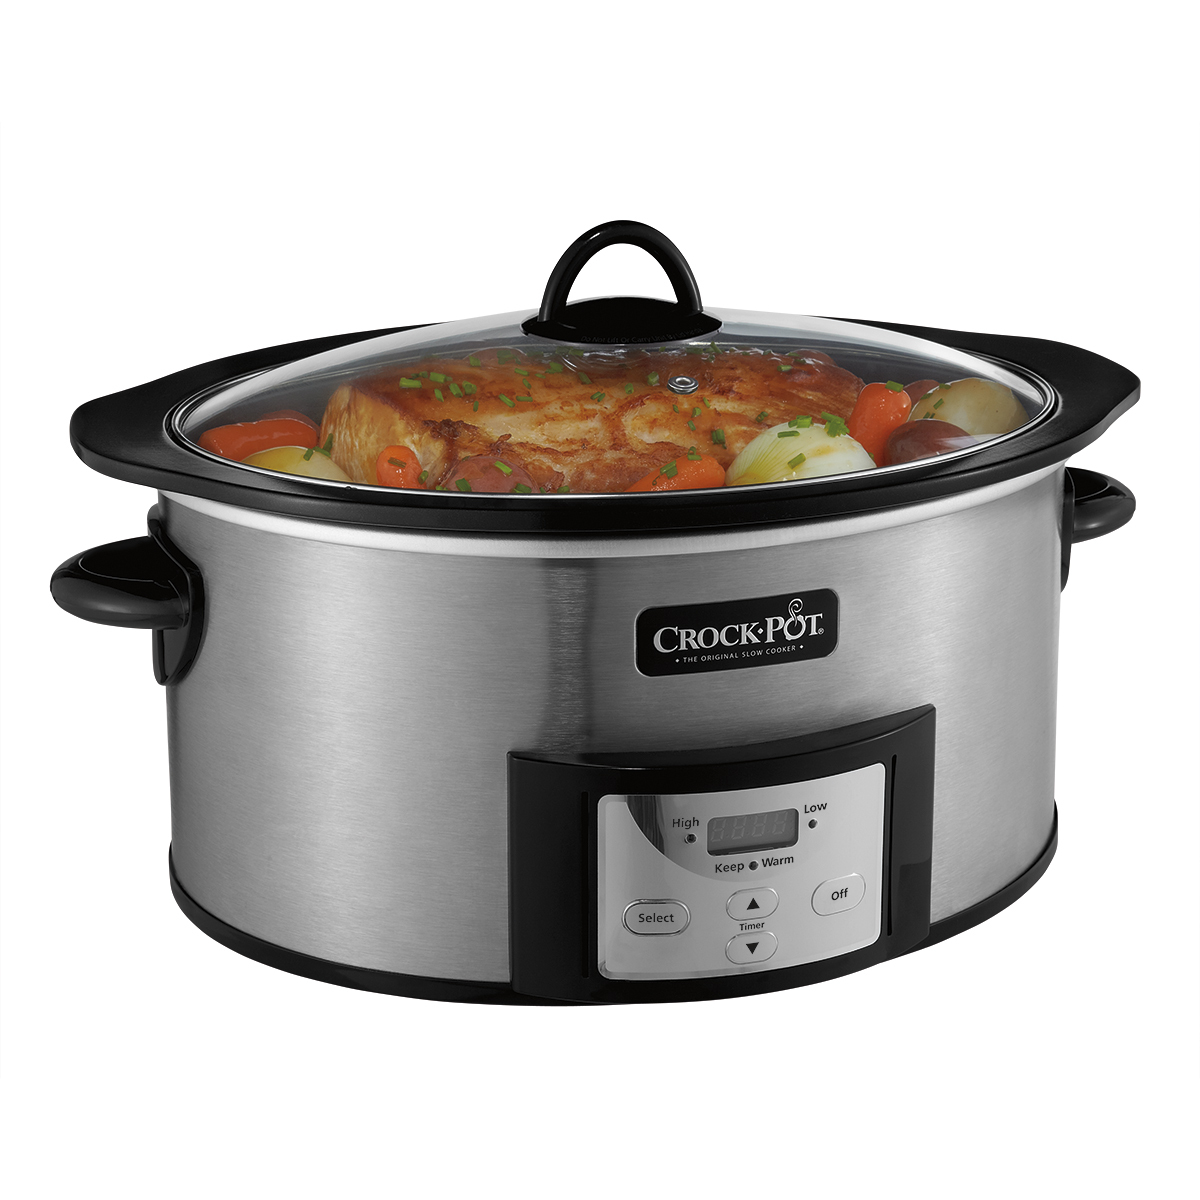 Crock-Pot 6-Quart Programmable Slow Cooker with Stovetop-Safe Cooking Pot